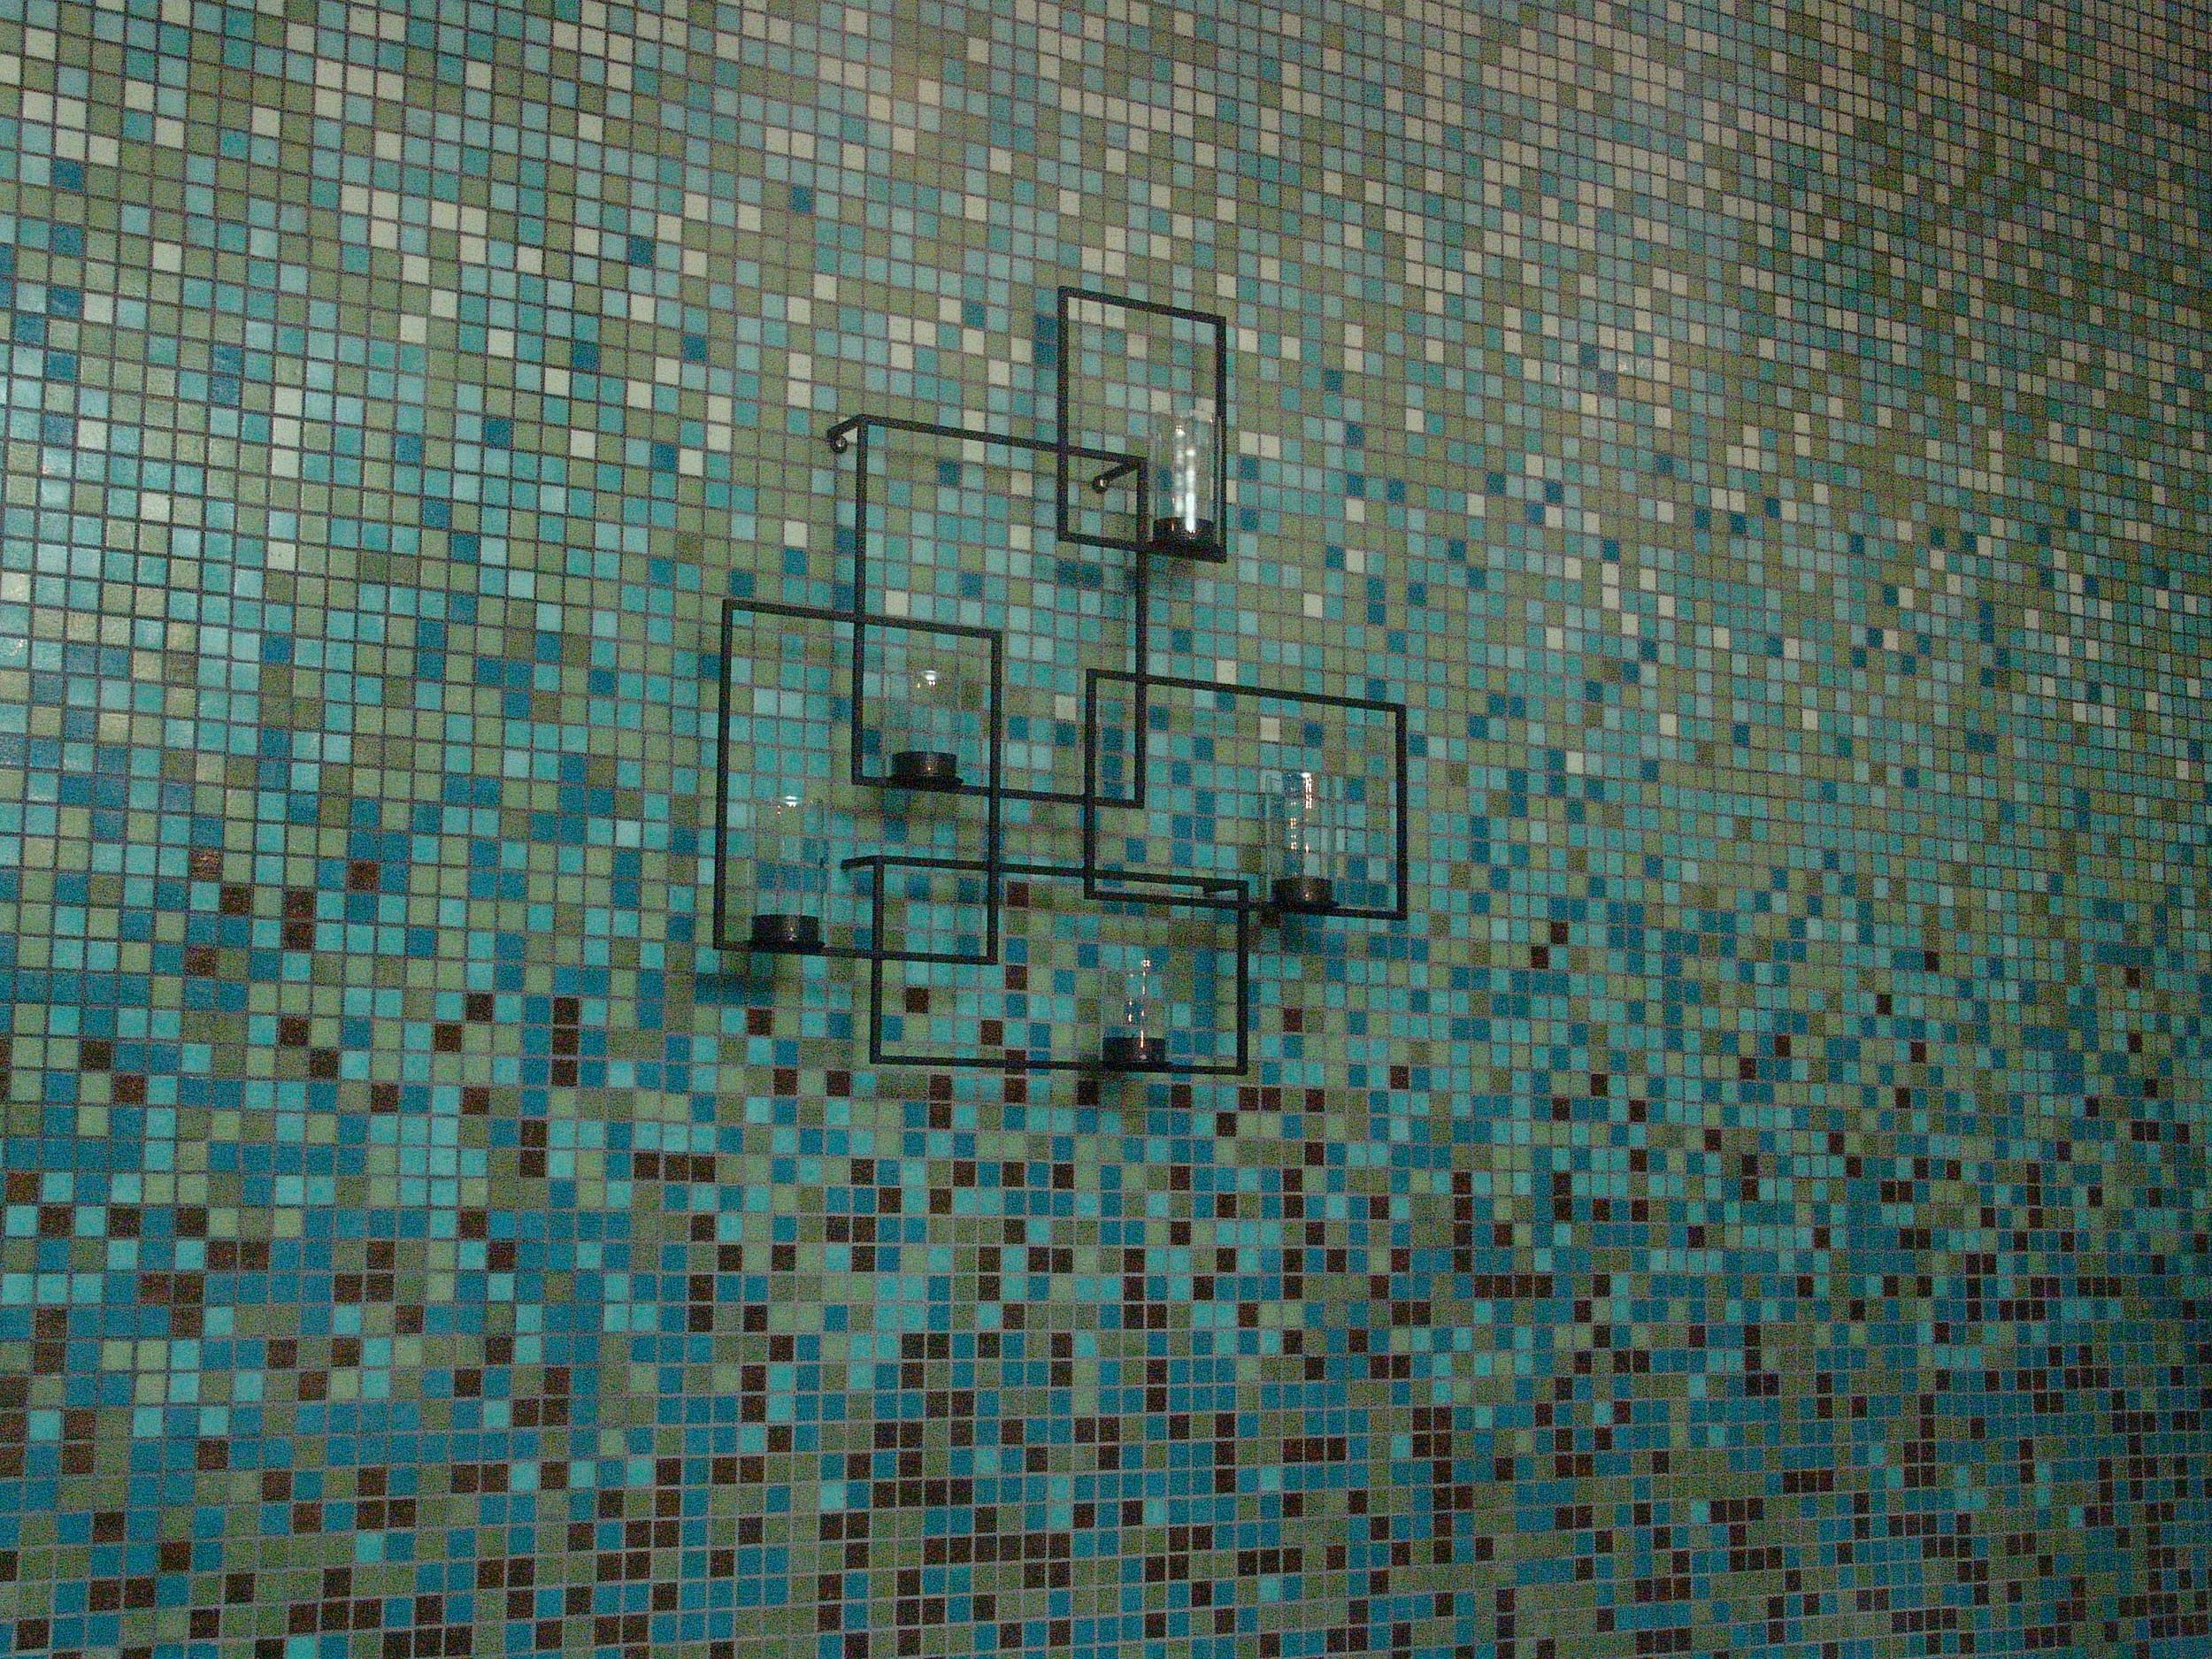 011-glass mosaic in massage room #3_3832.JPG